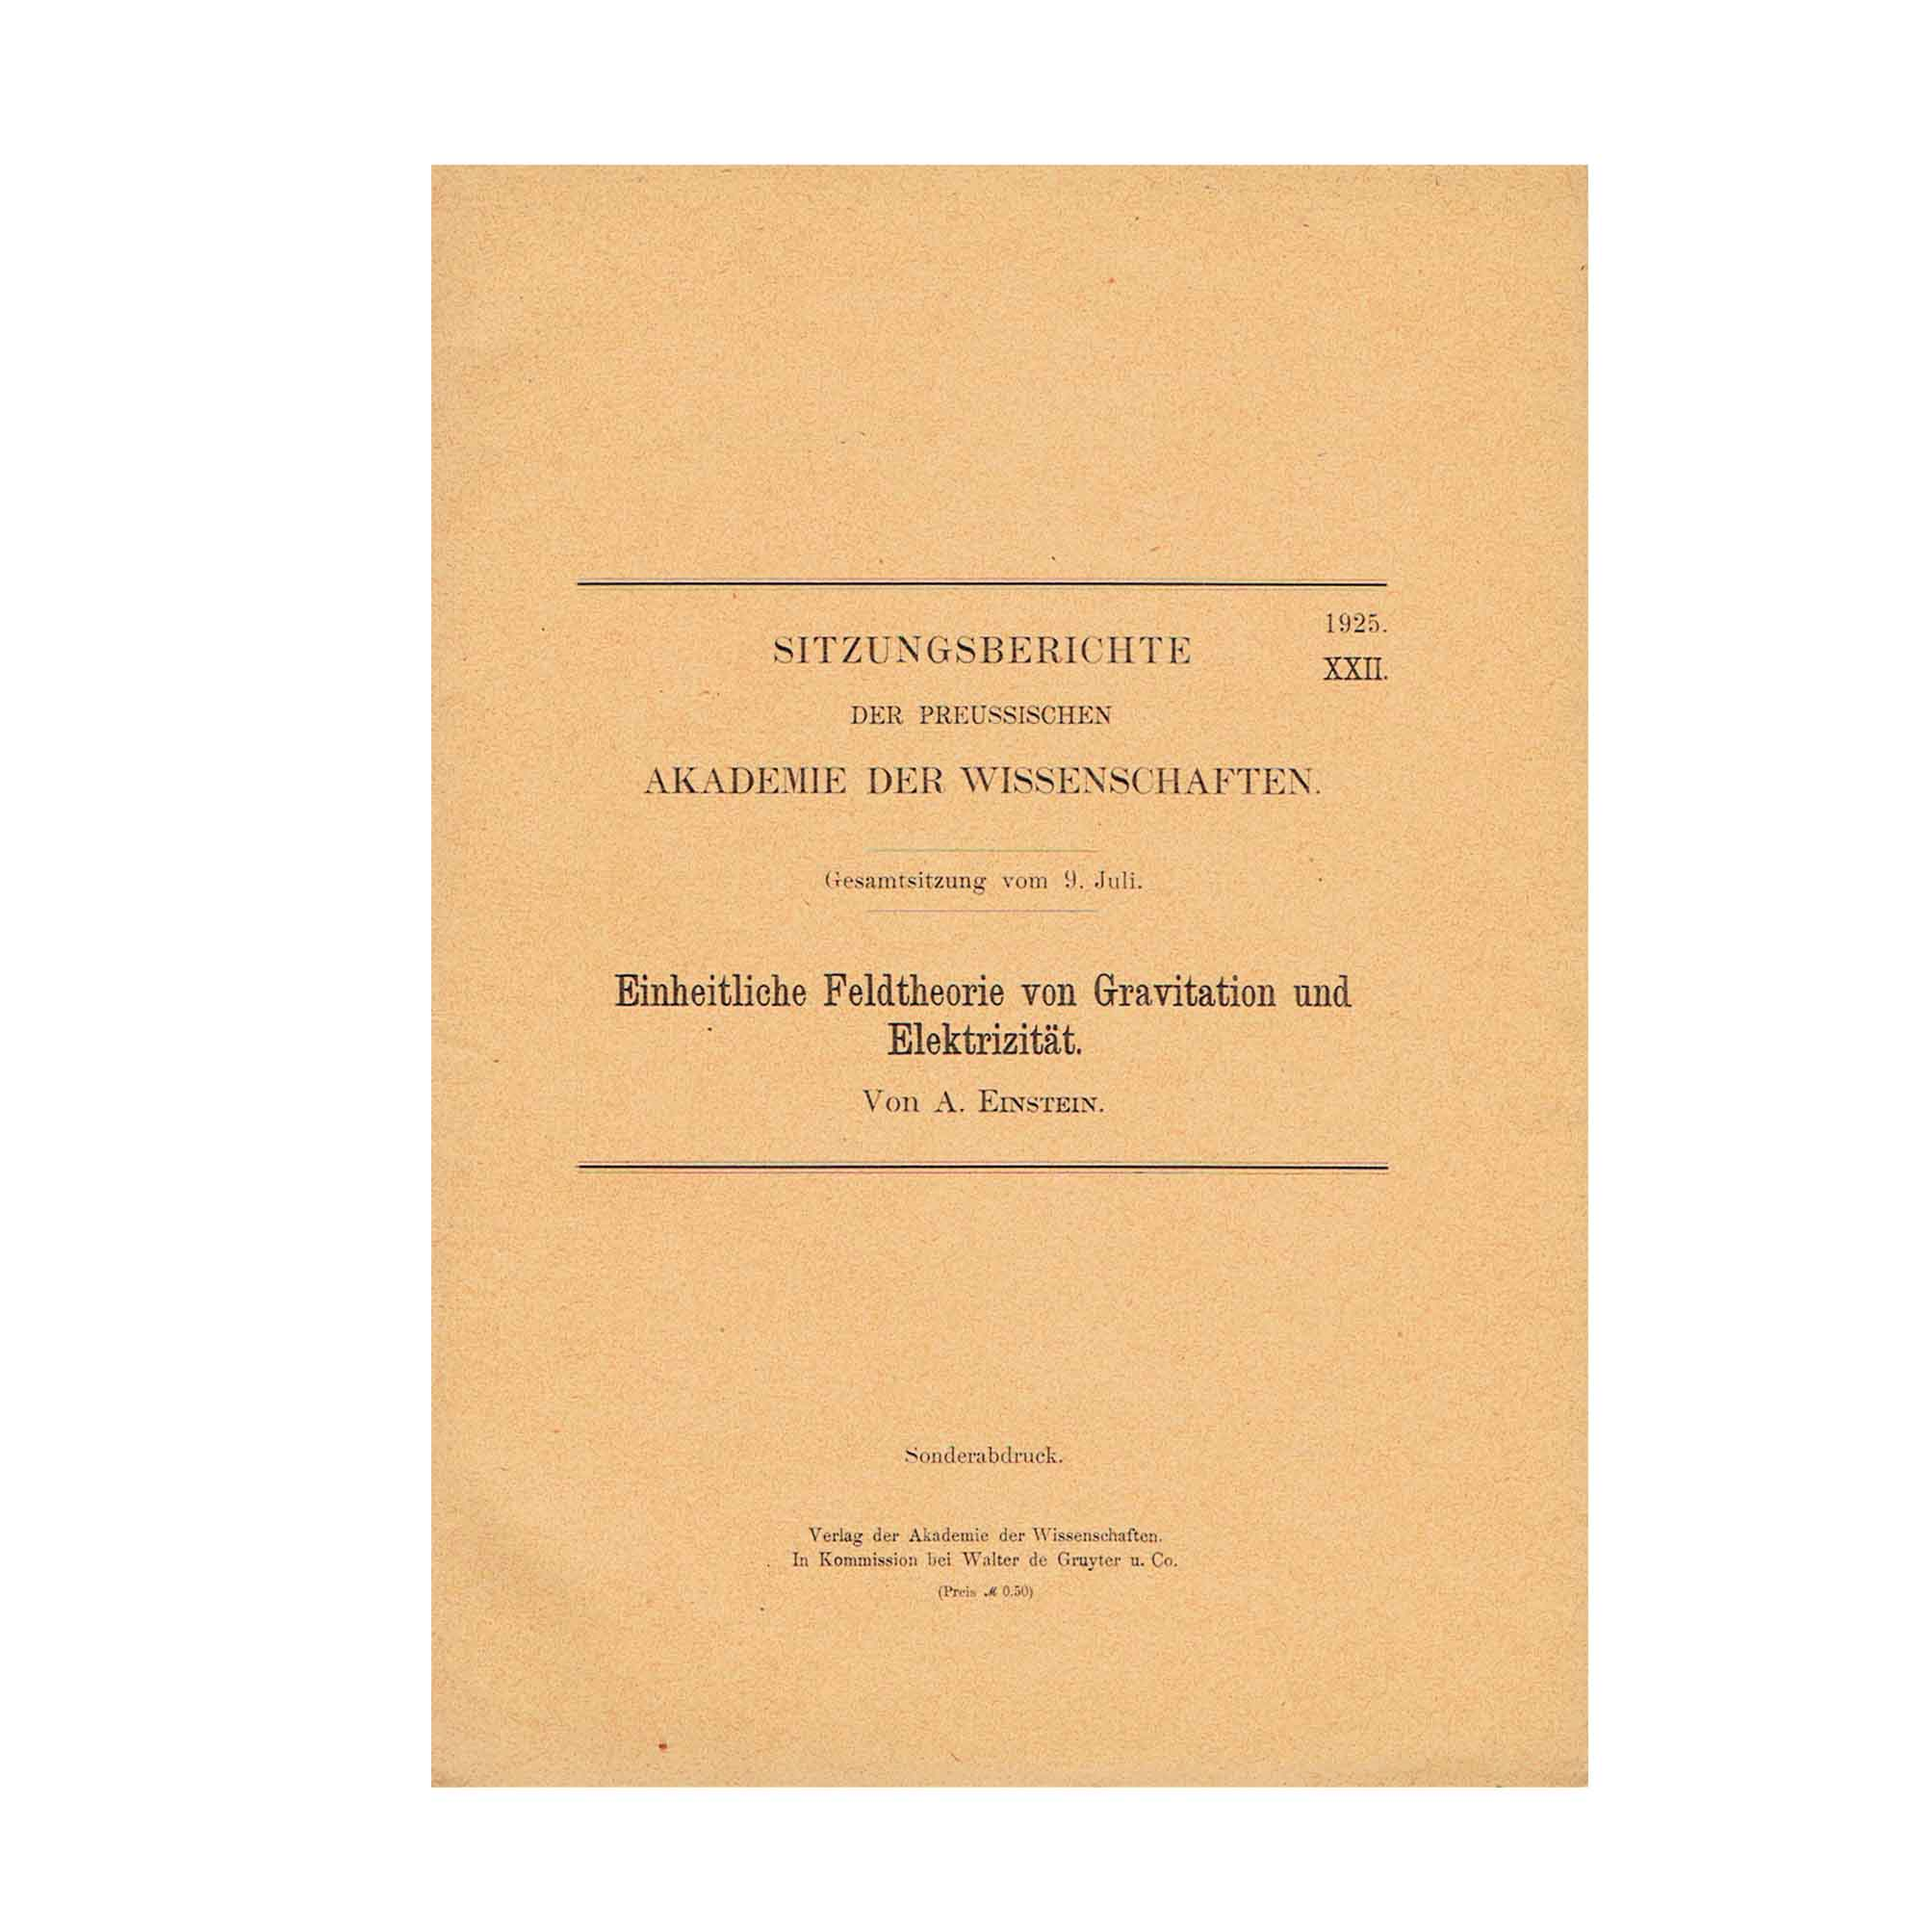 5734-Einstein-Gravity-Electricity-Akademie-XXII-1925-SA-Cover-recto-N.jpeg